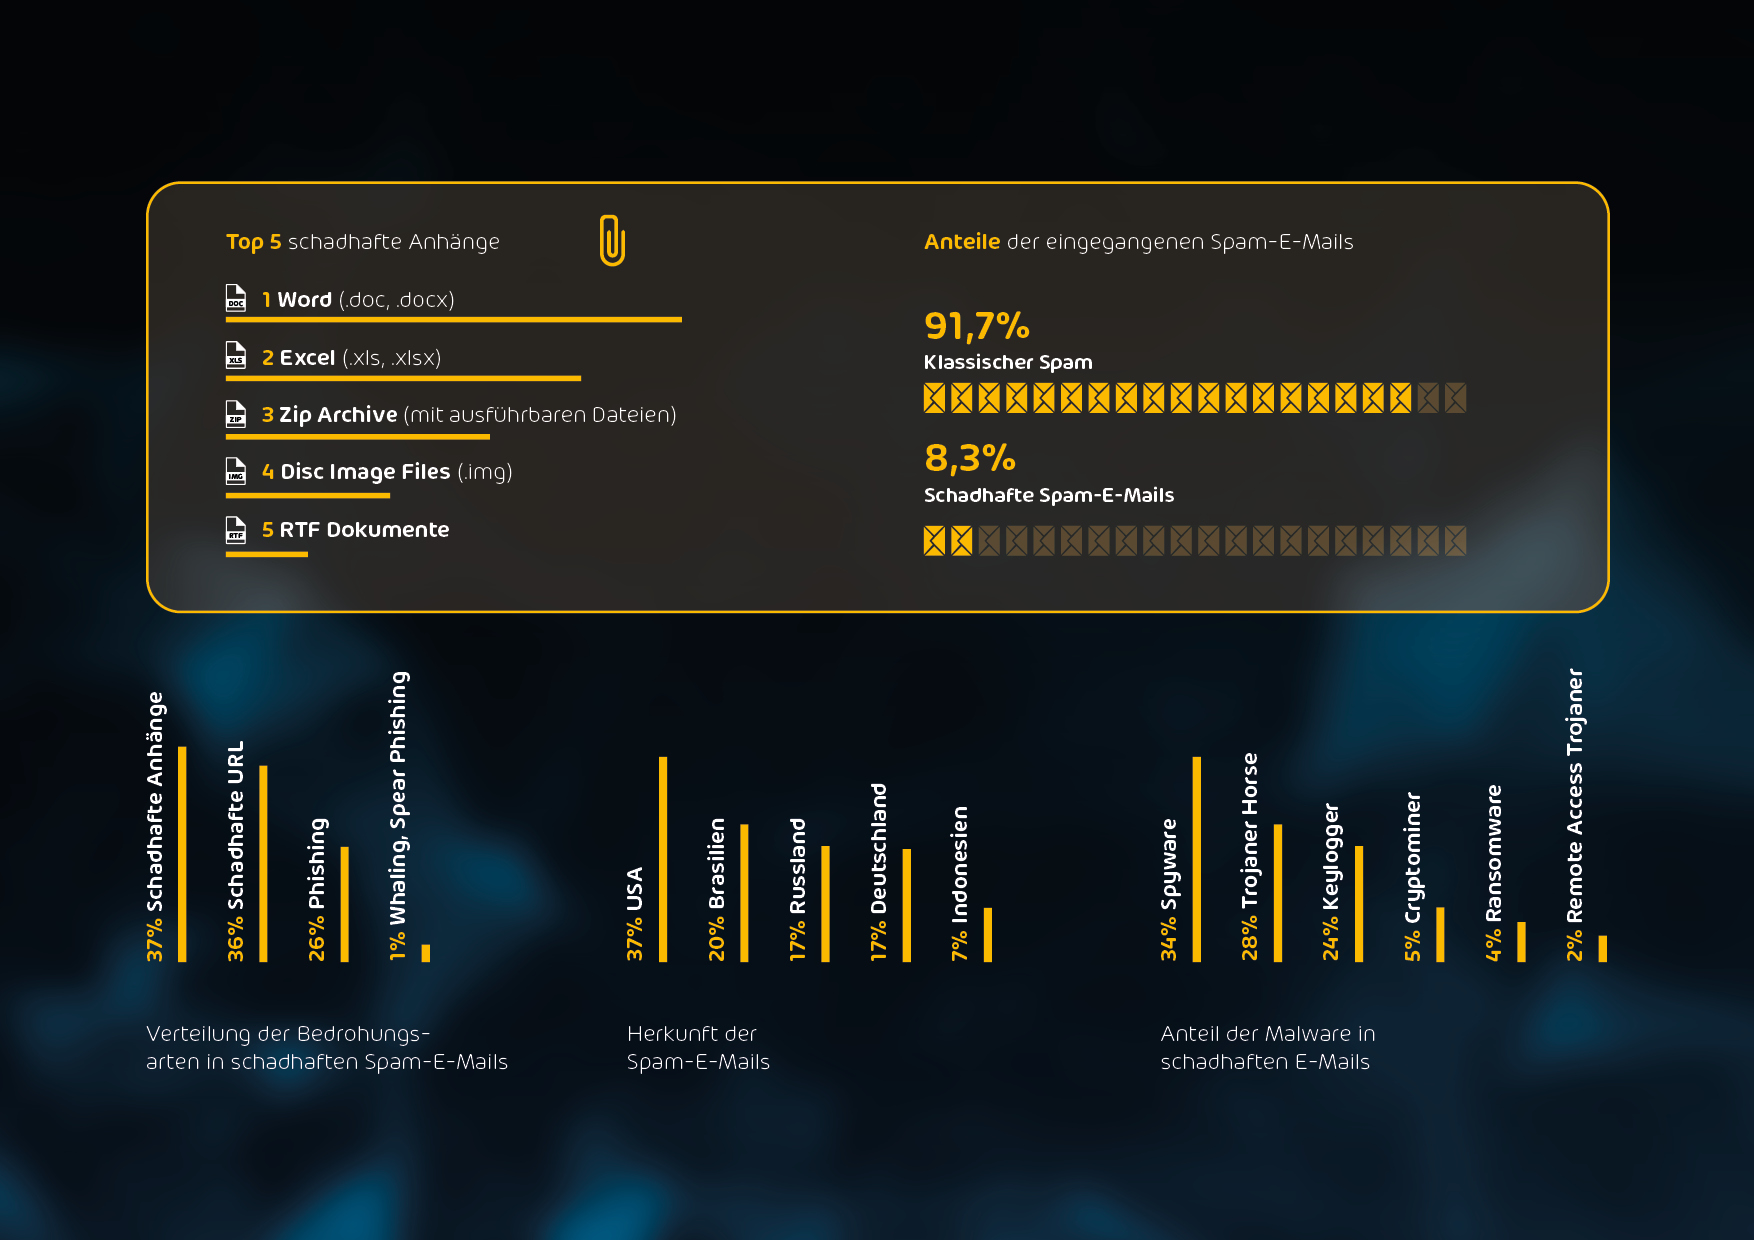 Hornetsecurity Cyberthreat Report, 1st Edition 2020